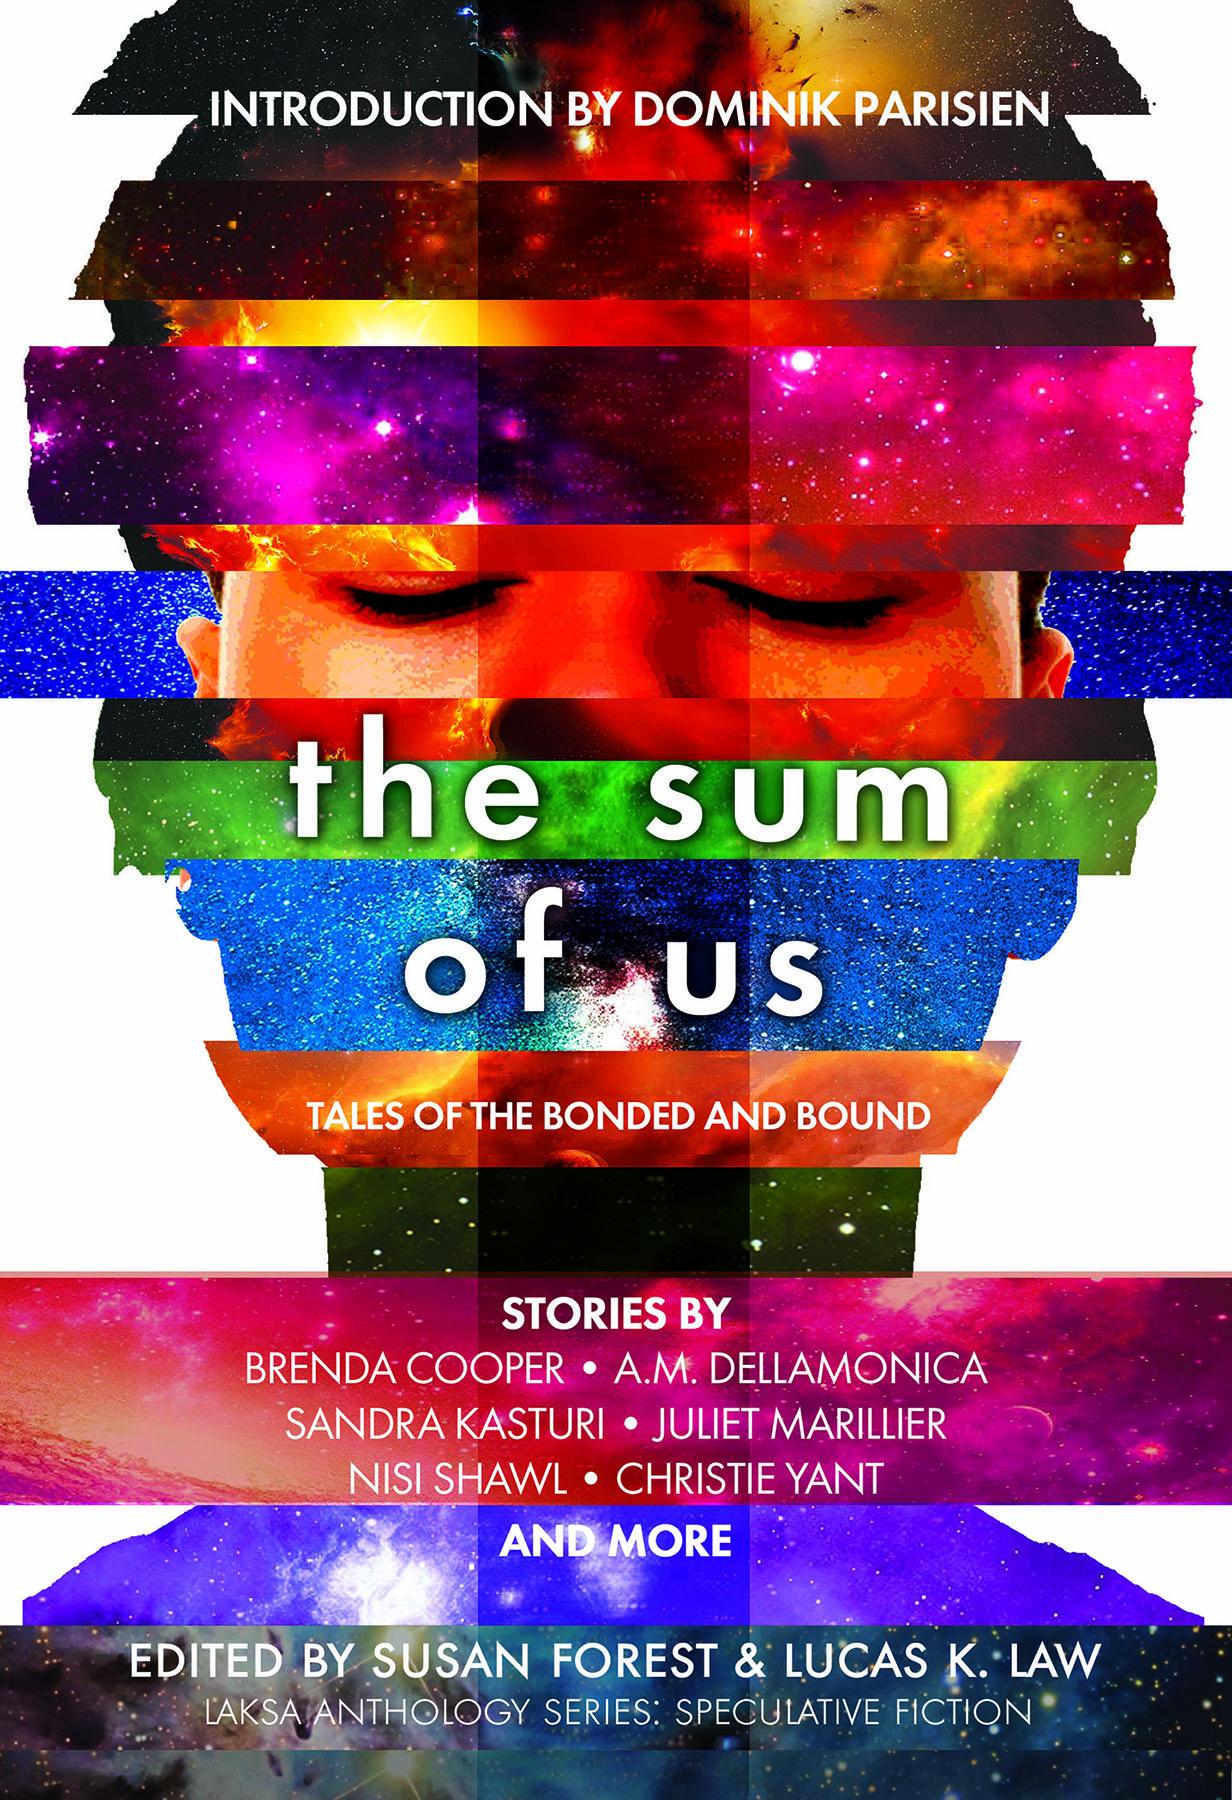 Susan Forest & Lucas K. Law - The Sum of Us